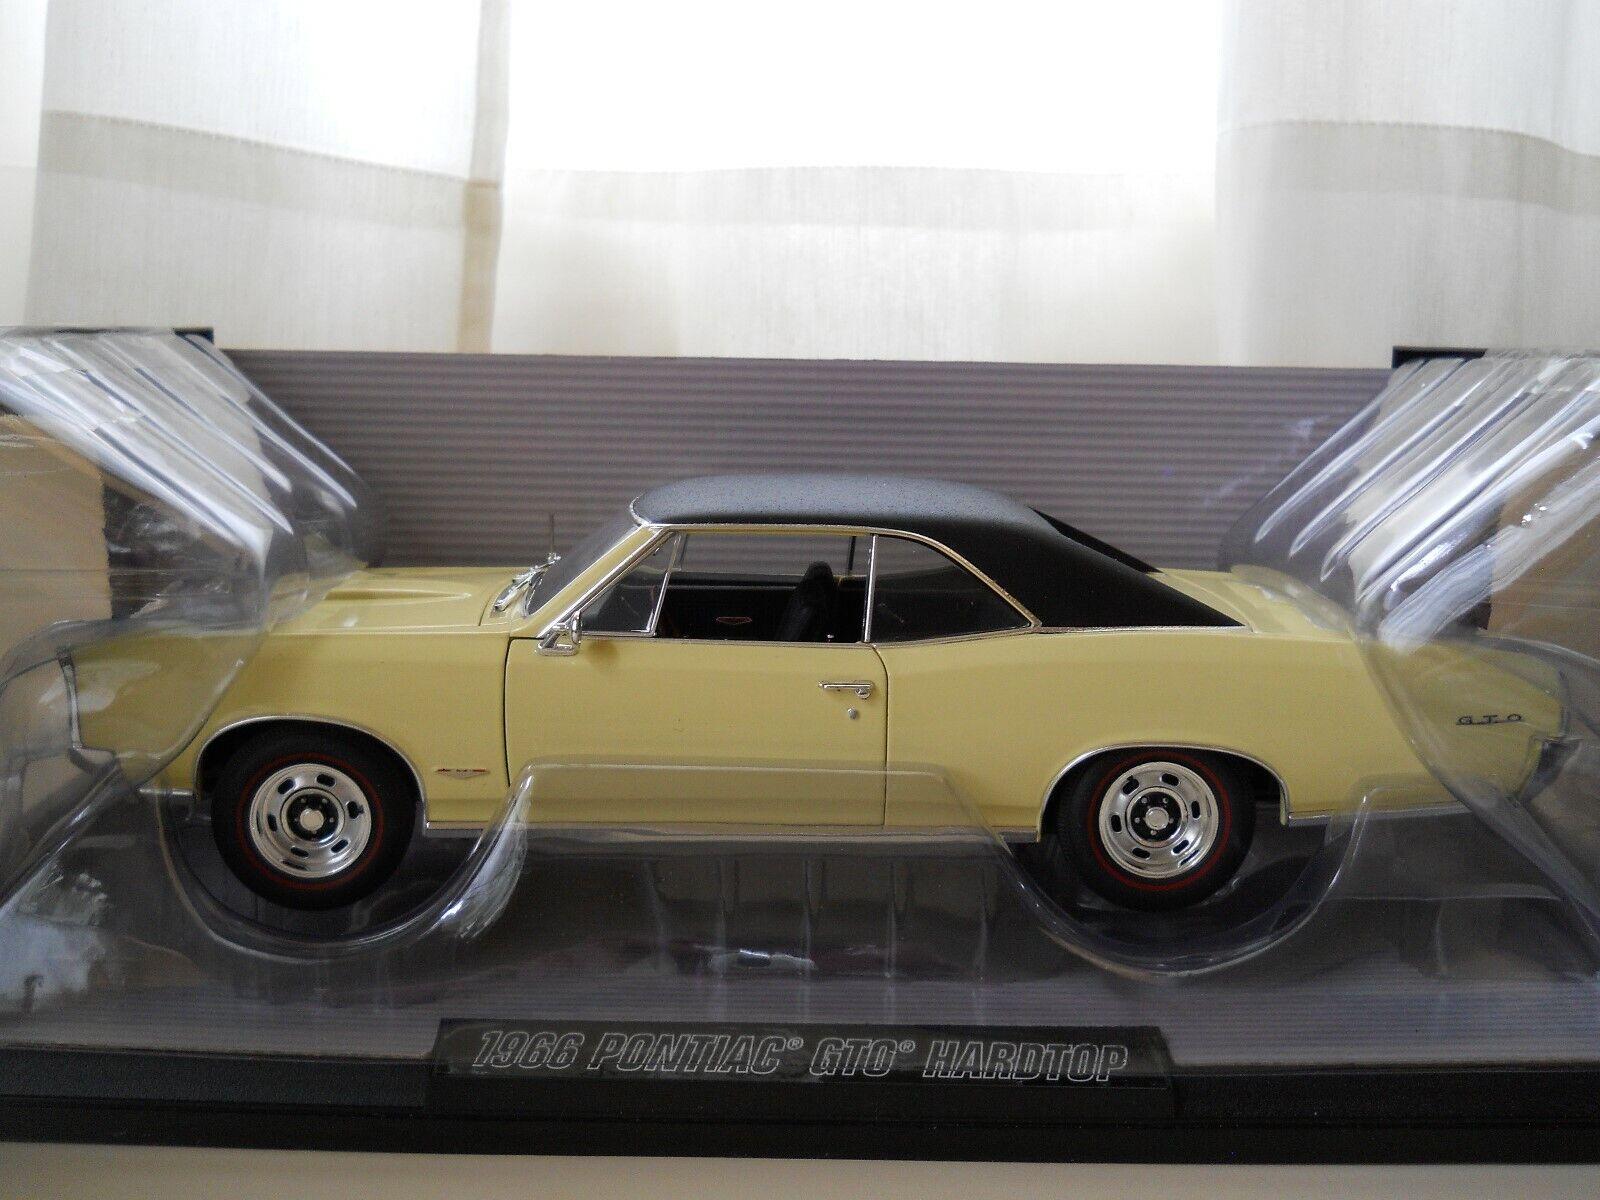 HIGHWAY 61   DIE-CAST PROMOTIONS - 1966 PONTIAC GTO HARDTOP - 1 18 DIECAST